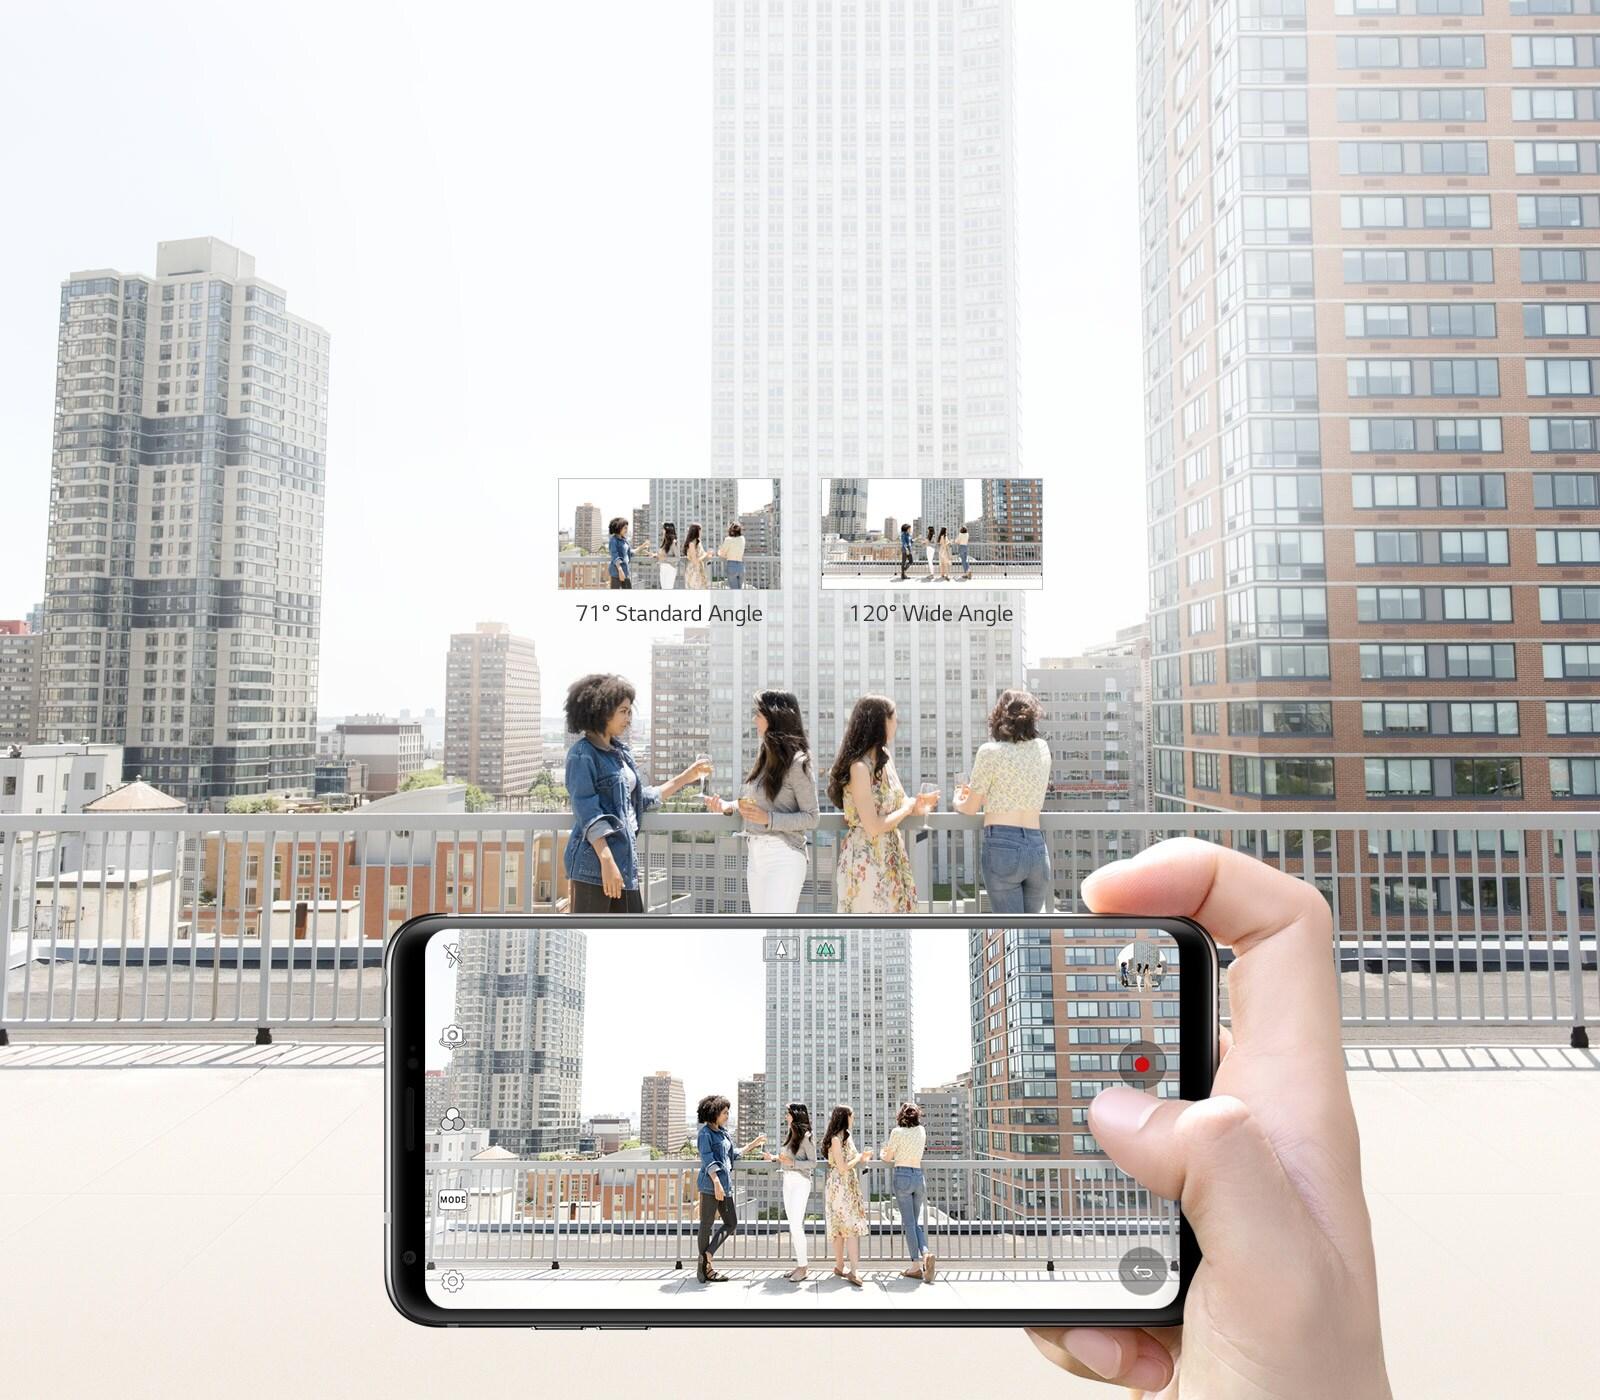 LG V30+ | LG Electronics UAE